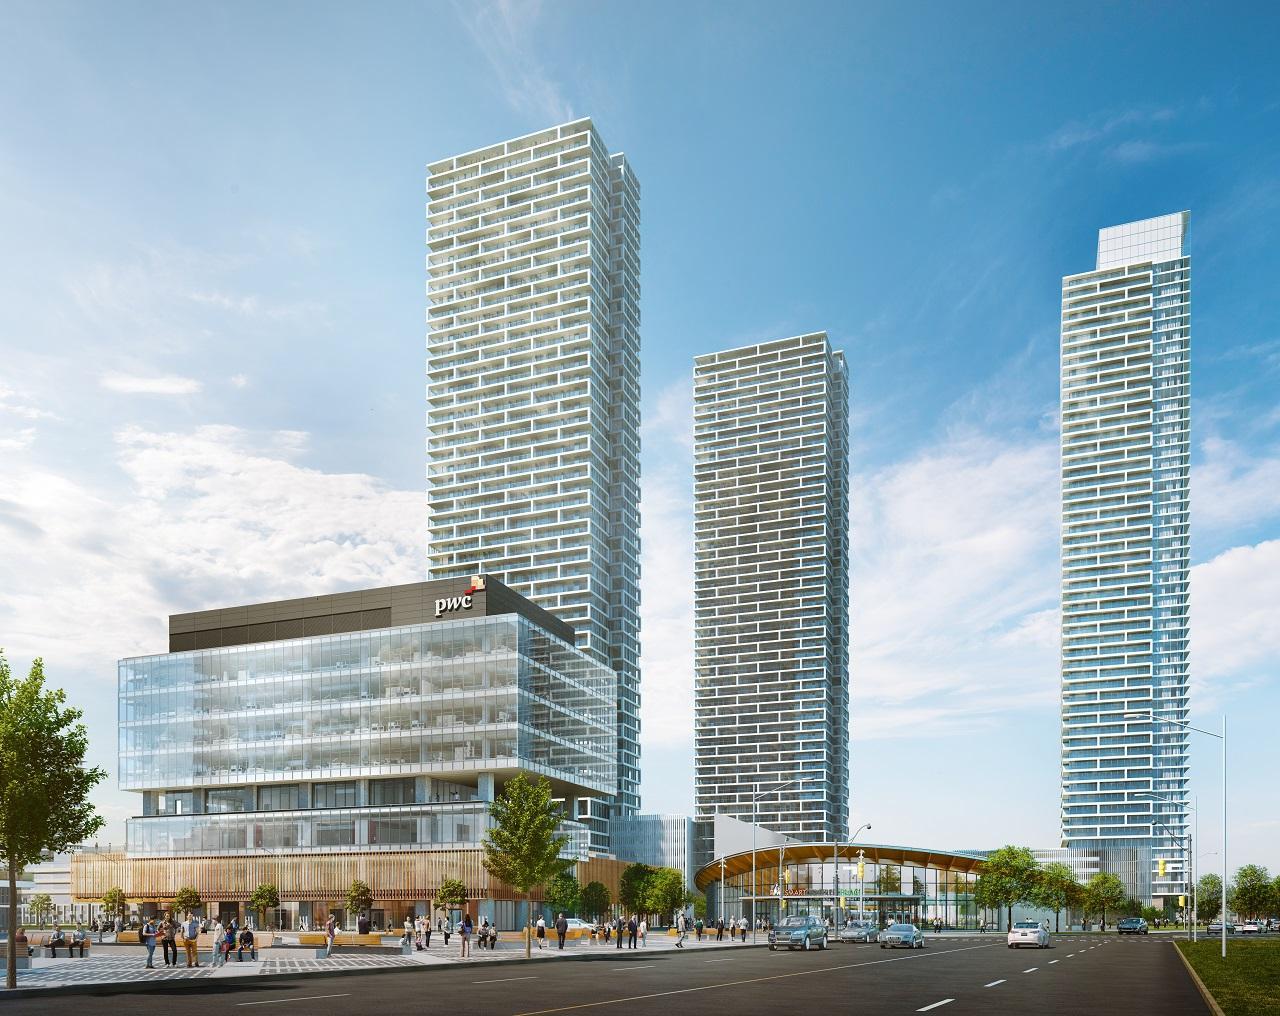 Transit City Condos, Vaughan, designed by Diamond Schmitt for CentreCourt